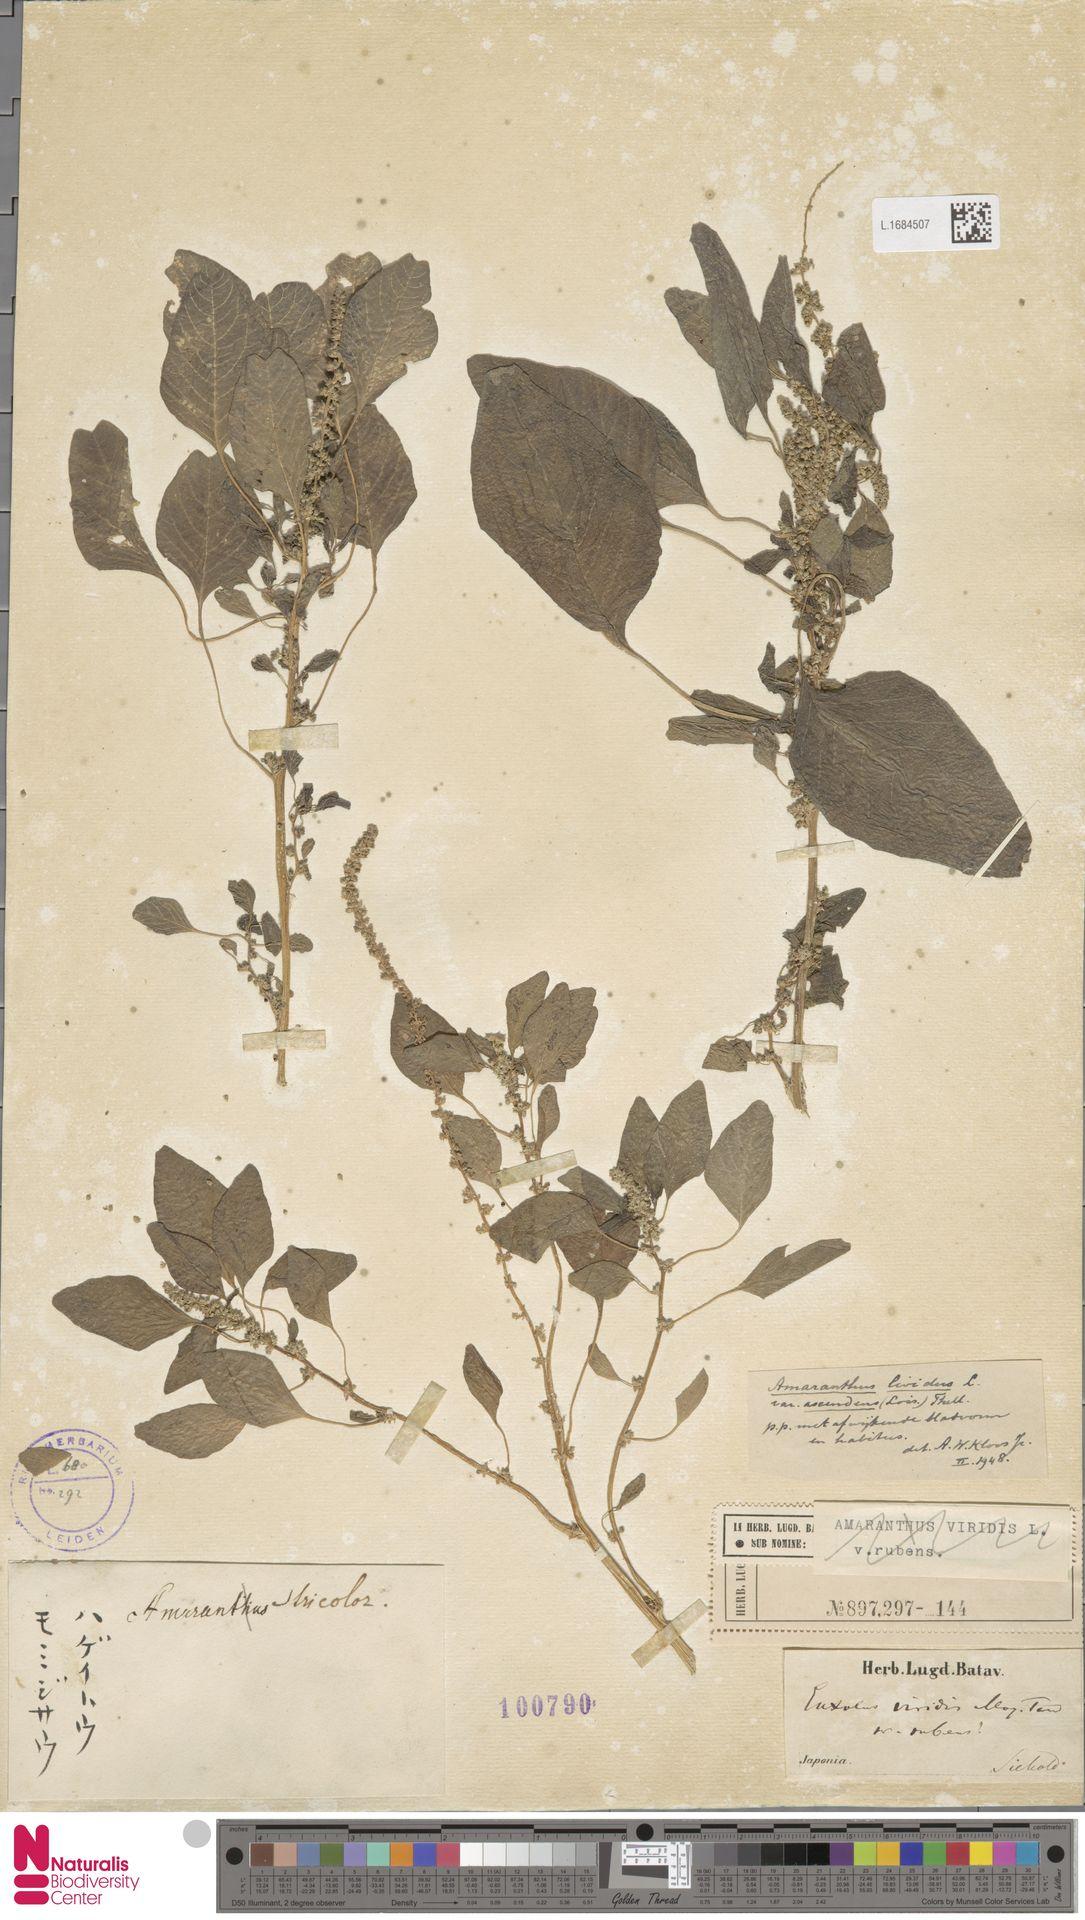 L.1684507 | Amaranthus lividus var. ascendens (Loisel.) Thell. ex Hayw. & Druce